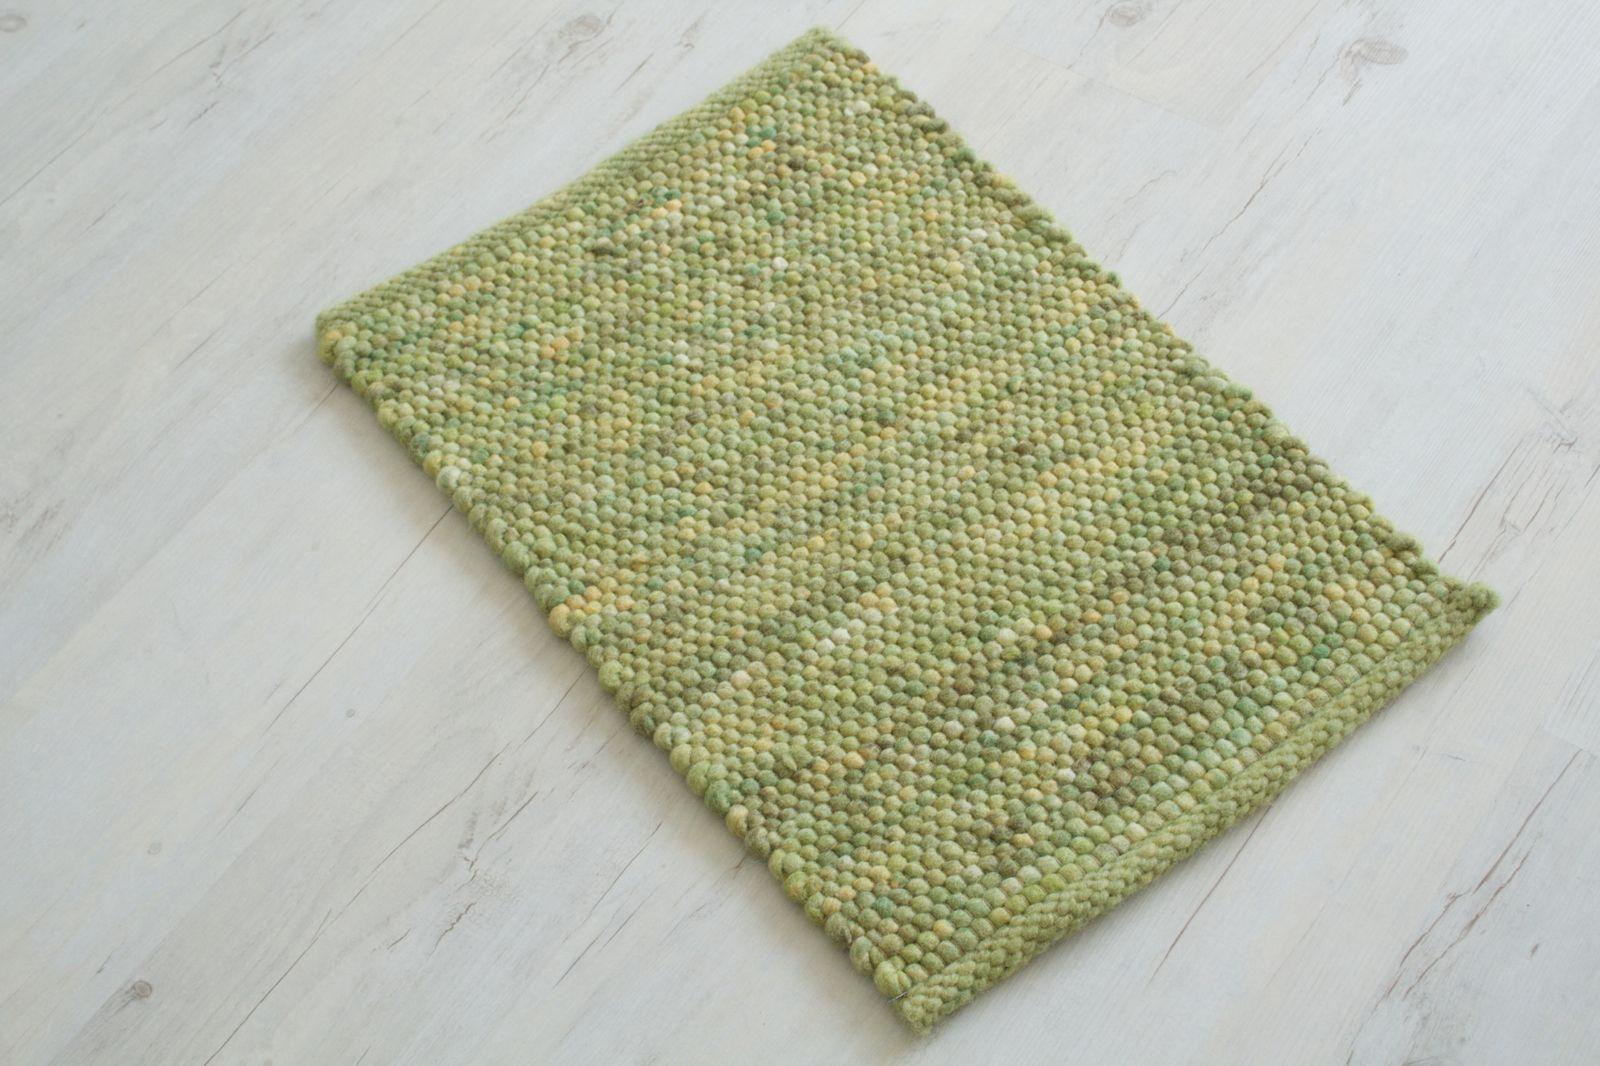 Pogo 60 x 40 cm Handgewebter Teppich Grün meliert